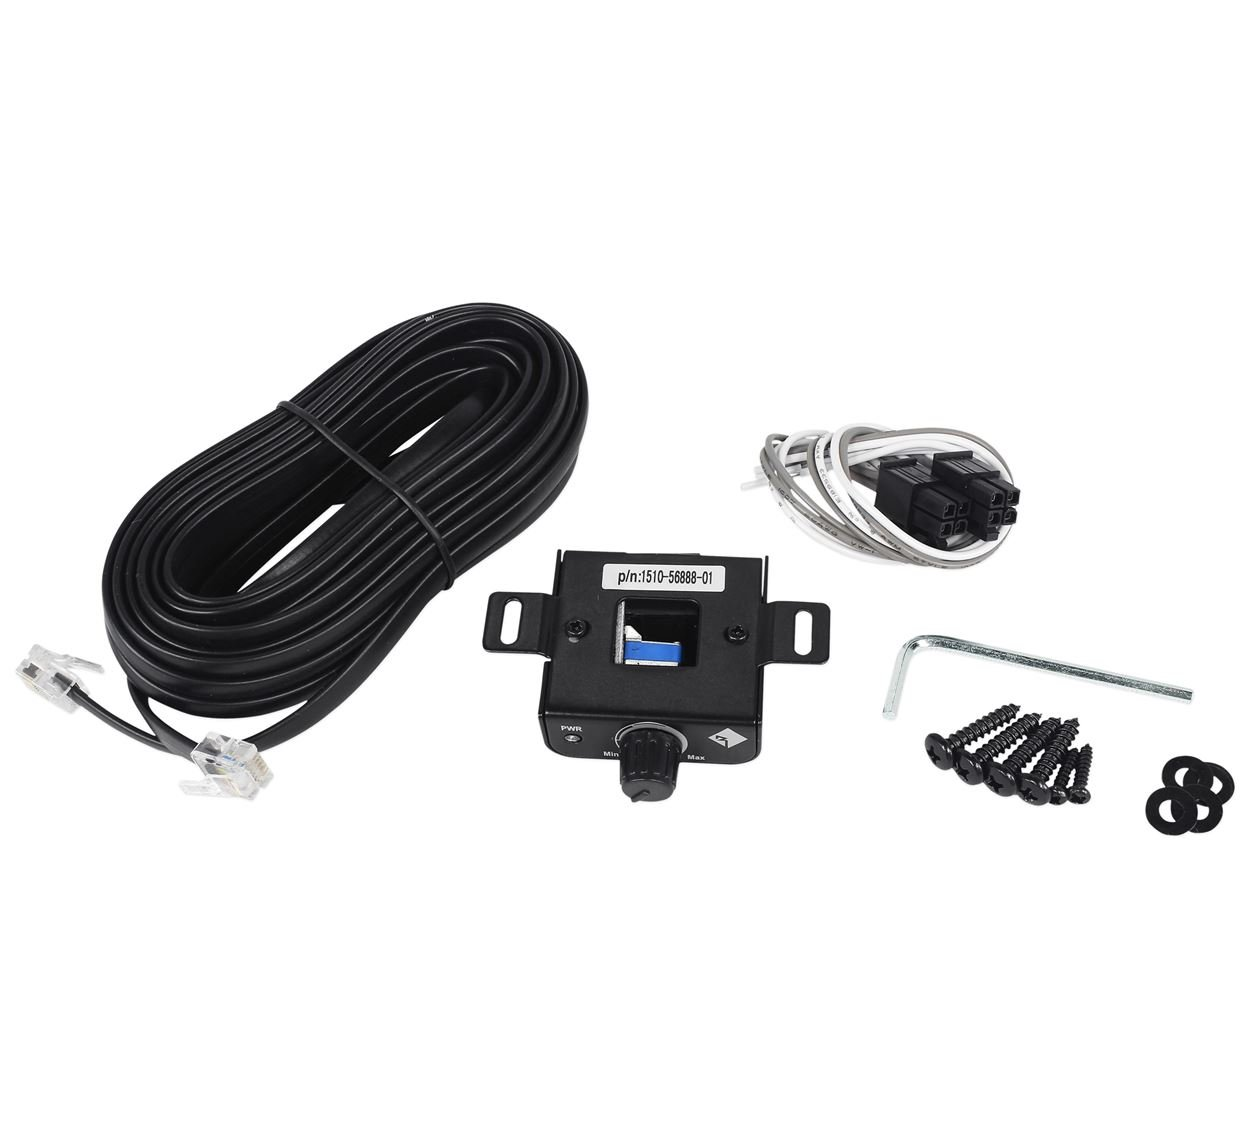 Rockford Fosgate R250x1 250 Watt Rms Mono Block Car Punch 45 Specs Audio Amplifier Amp Kit Cell Phones Accessories